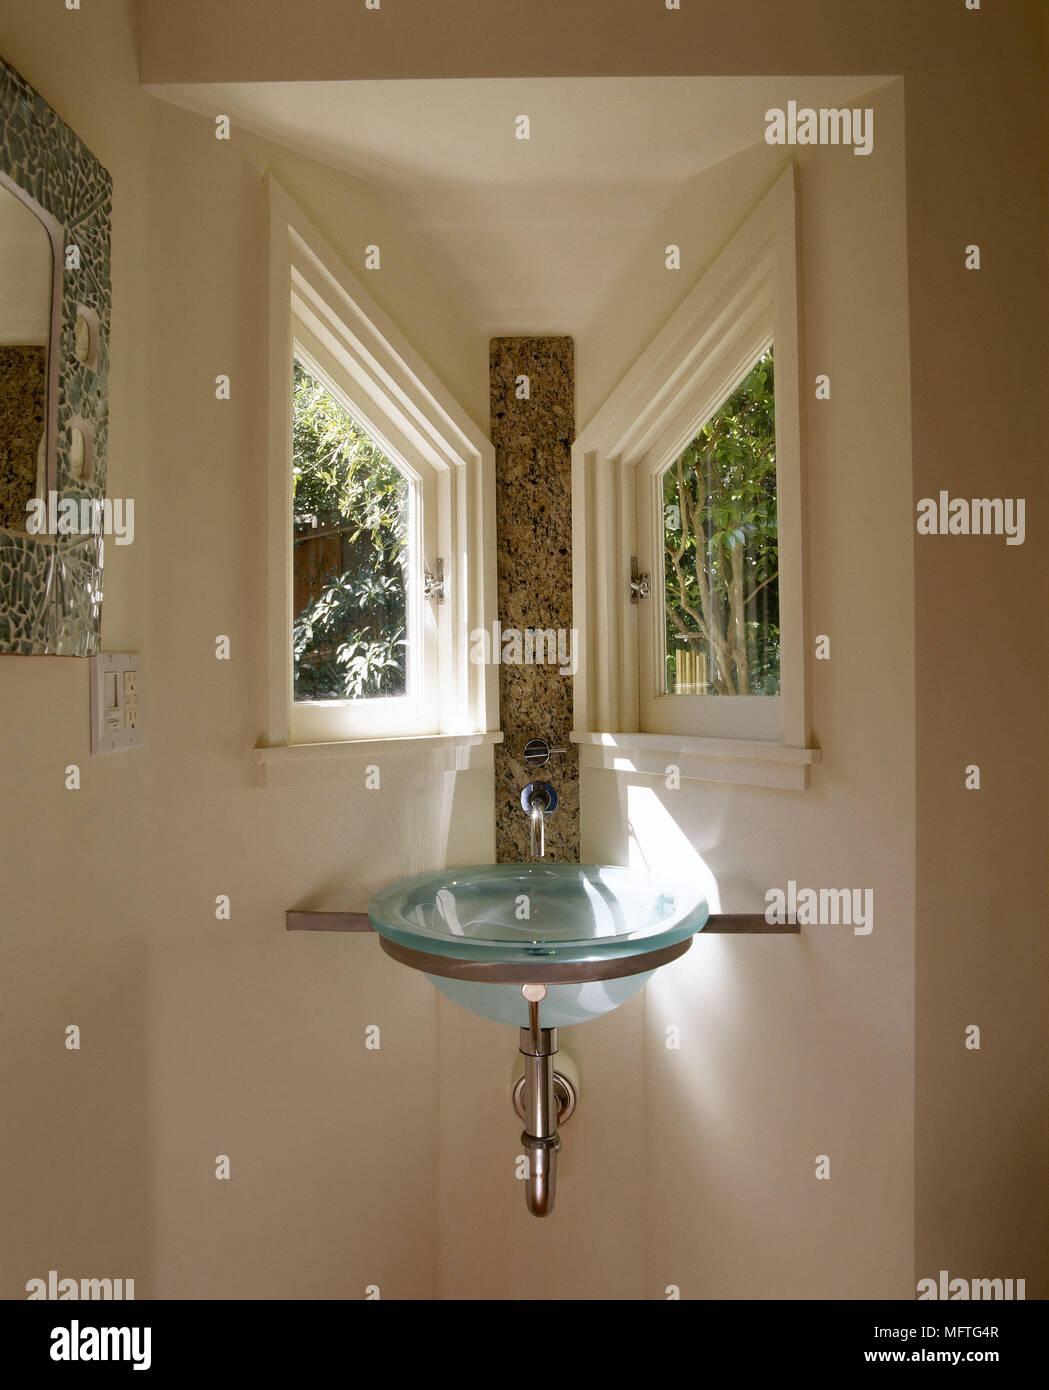 Image of: Modern Bathroom Detail Glass Wash Basin Set In Corner Angled Windows Interiors Bathrooms Sinks Space Saving Stock Photo Alamy